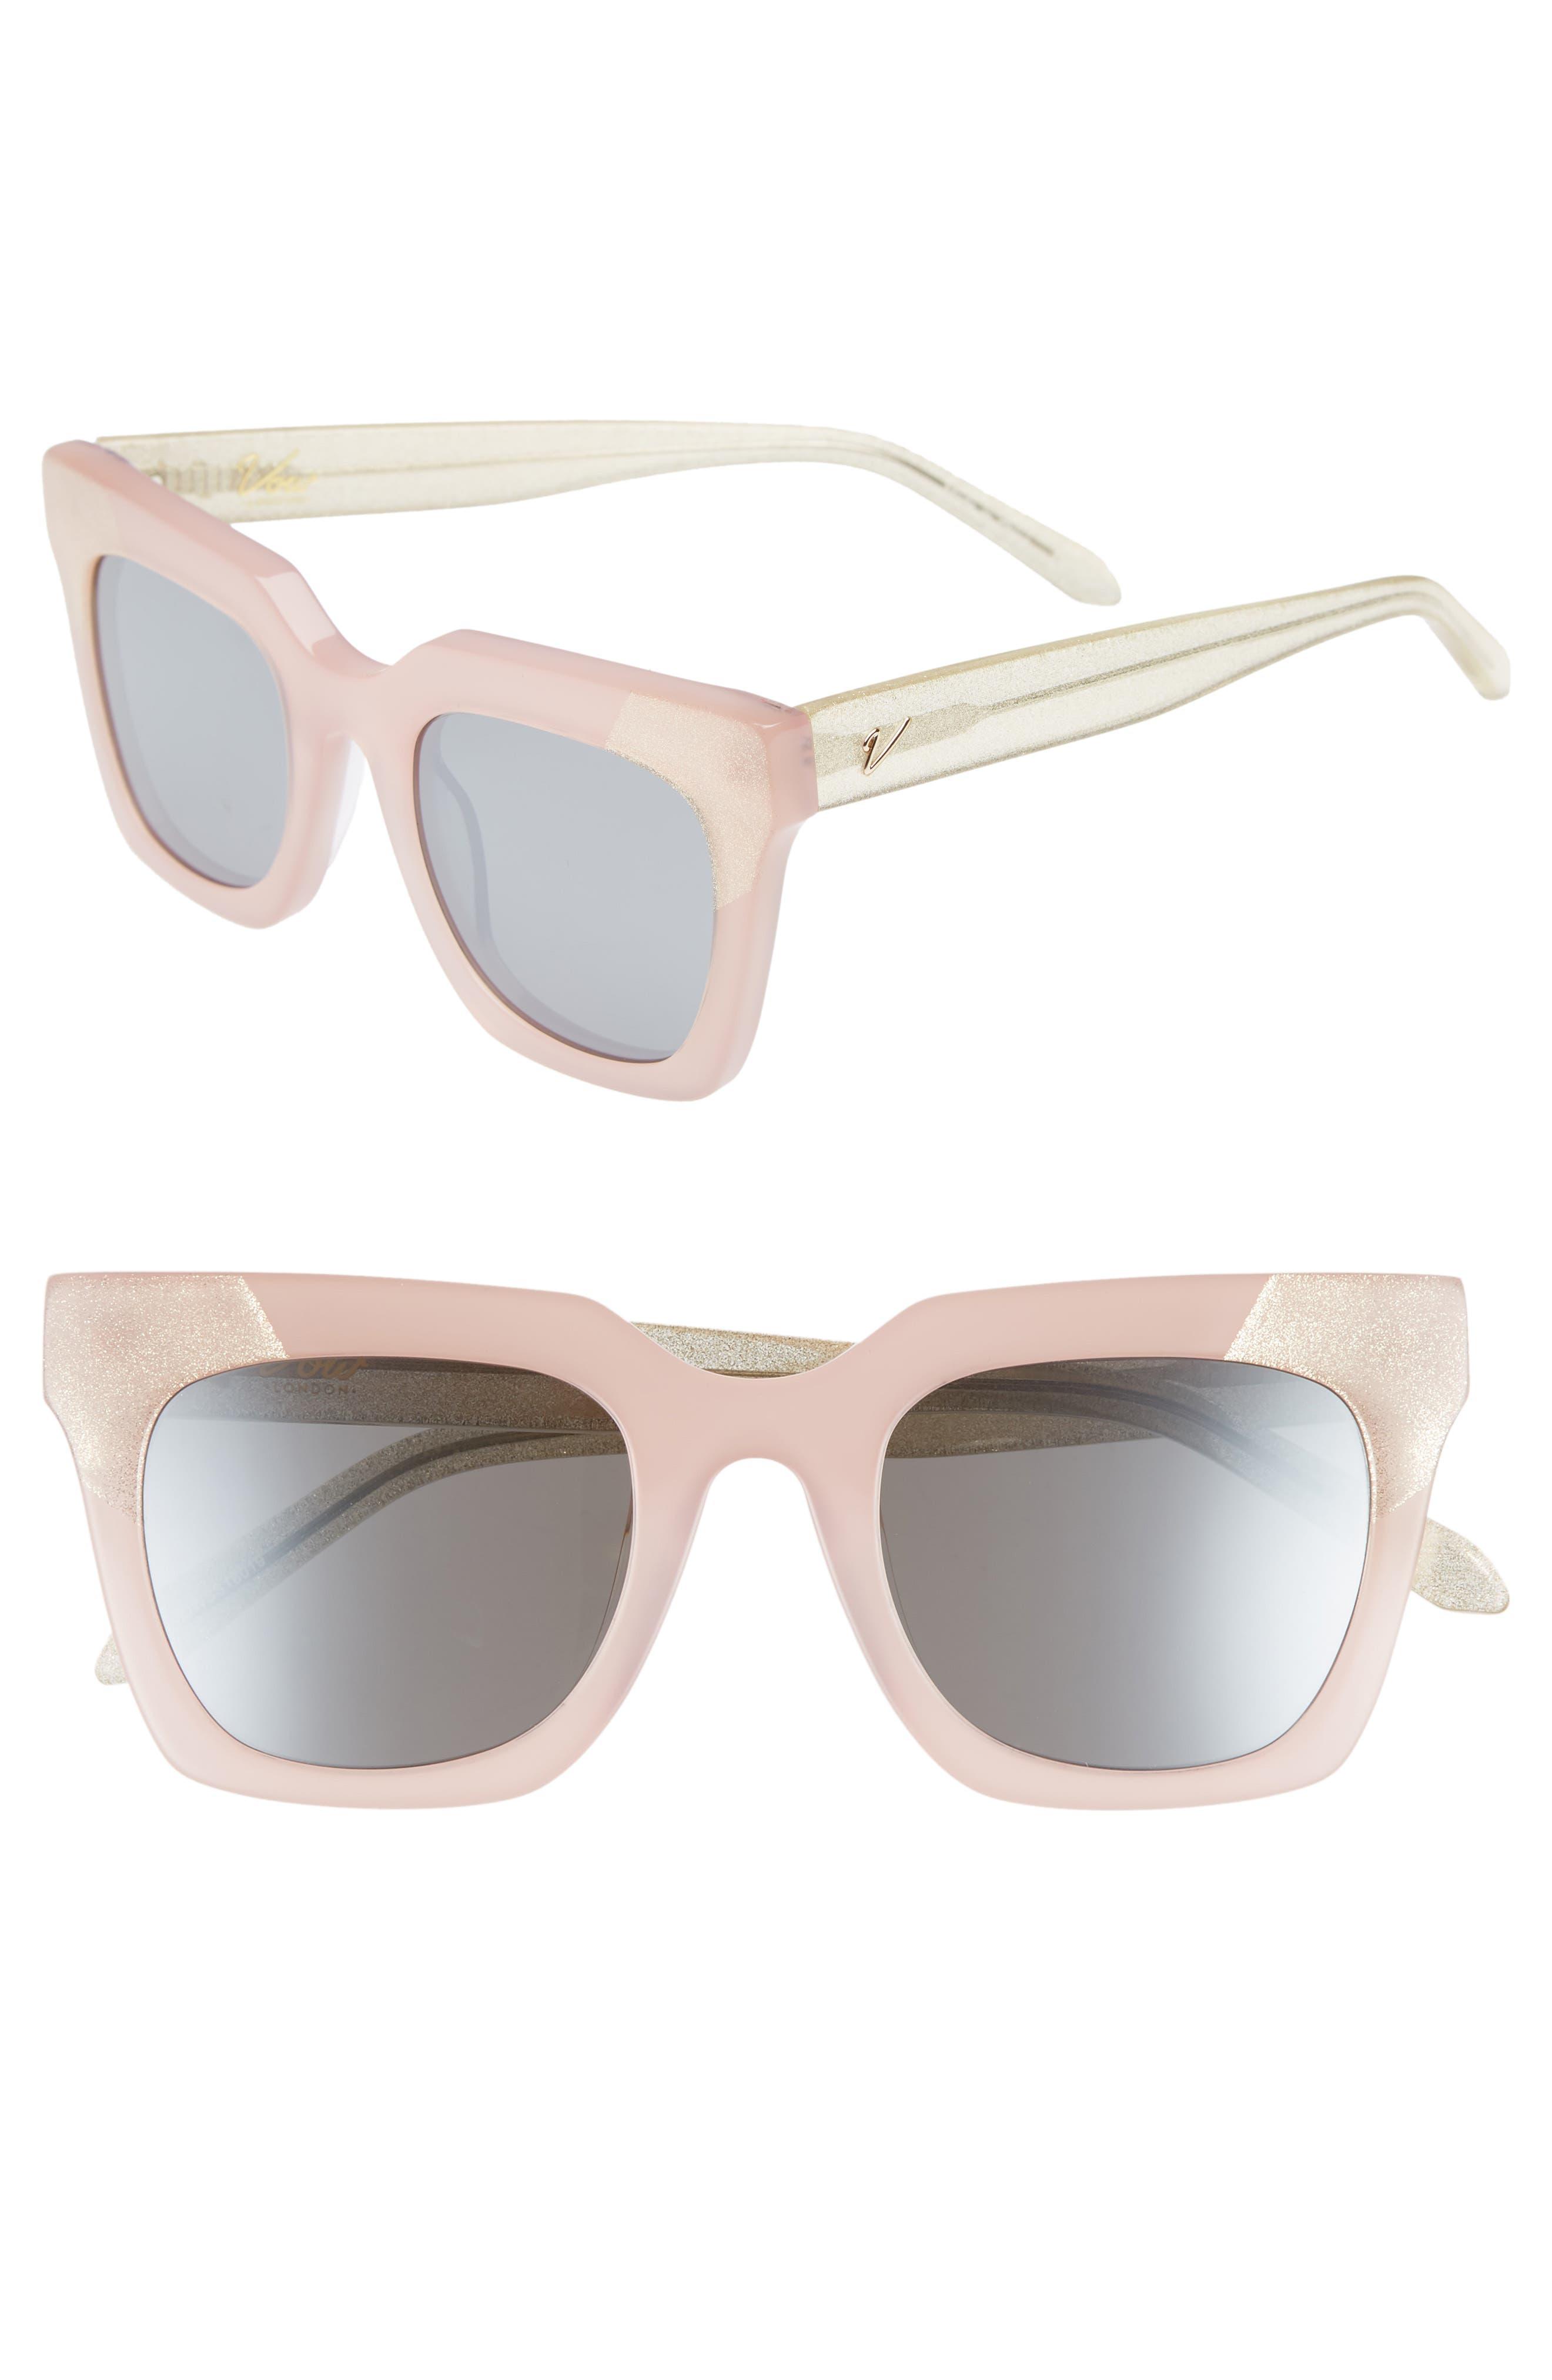 Riley 50mm Cat Eye Sunglasses,                         Main,                         color, Milky Pink/ Smoke